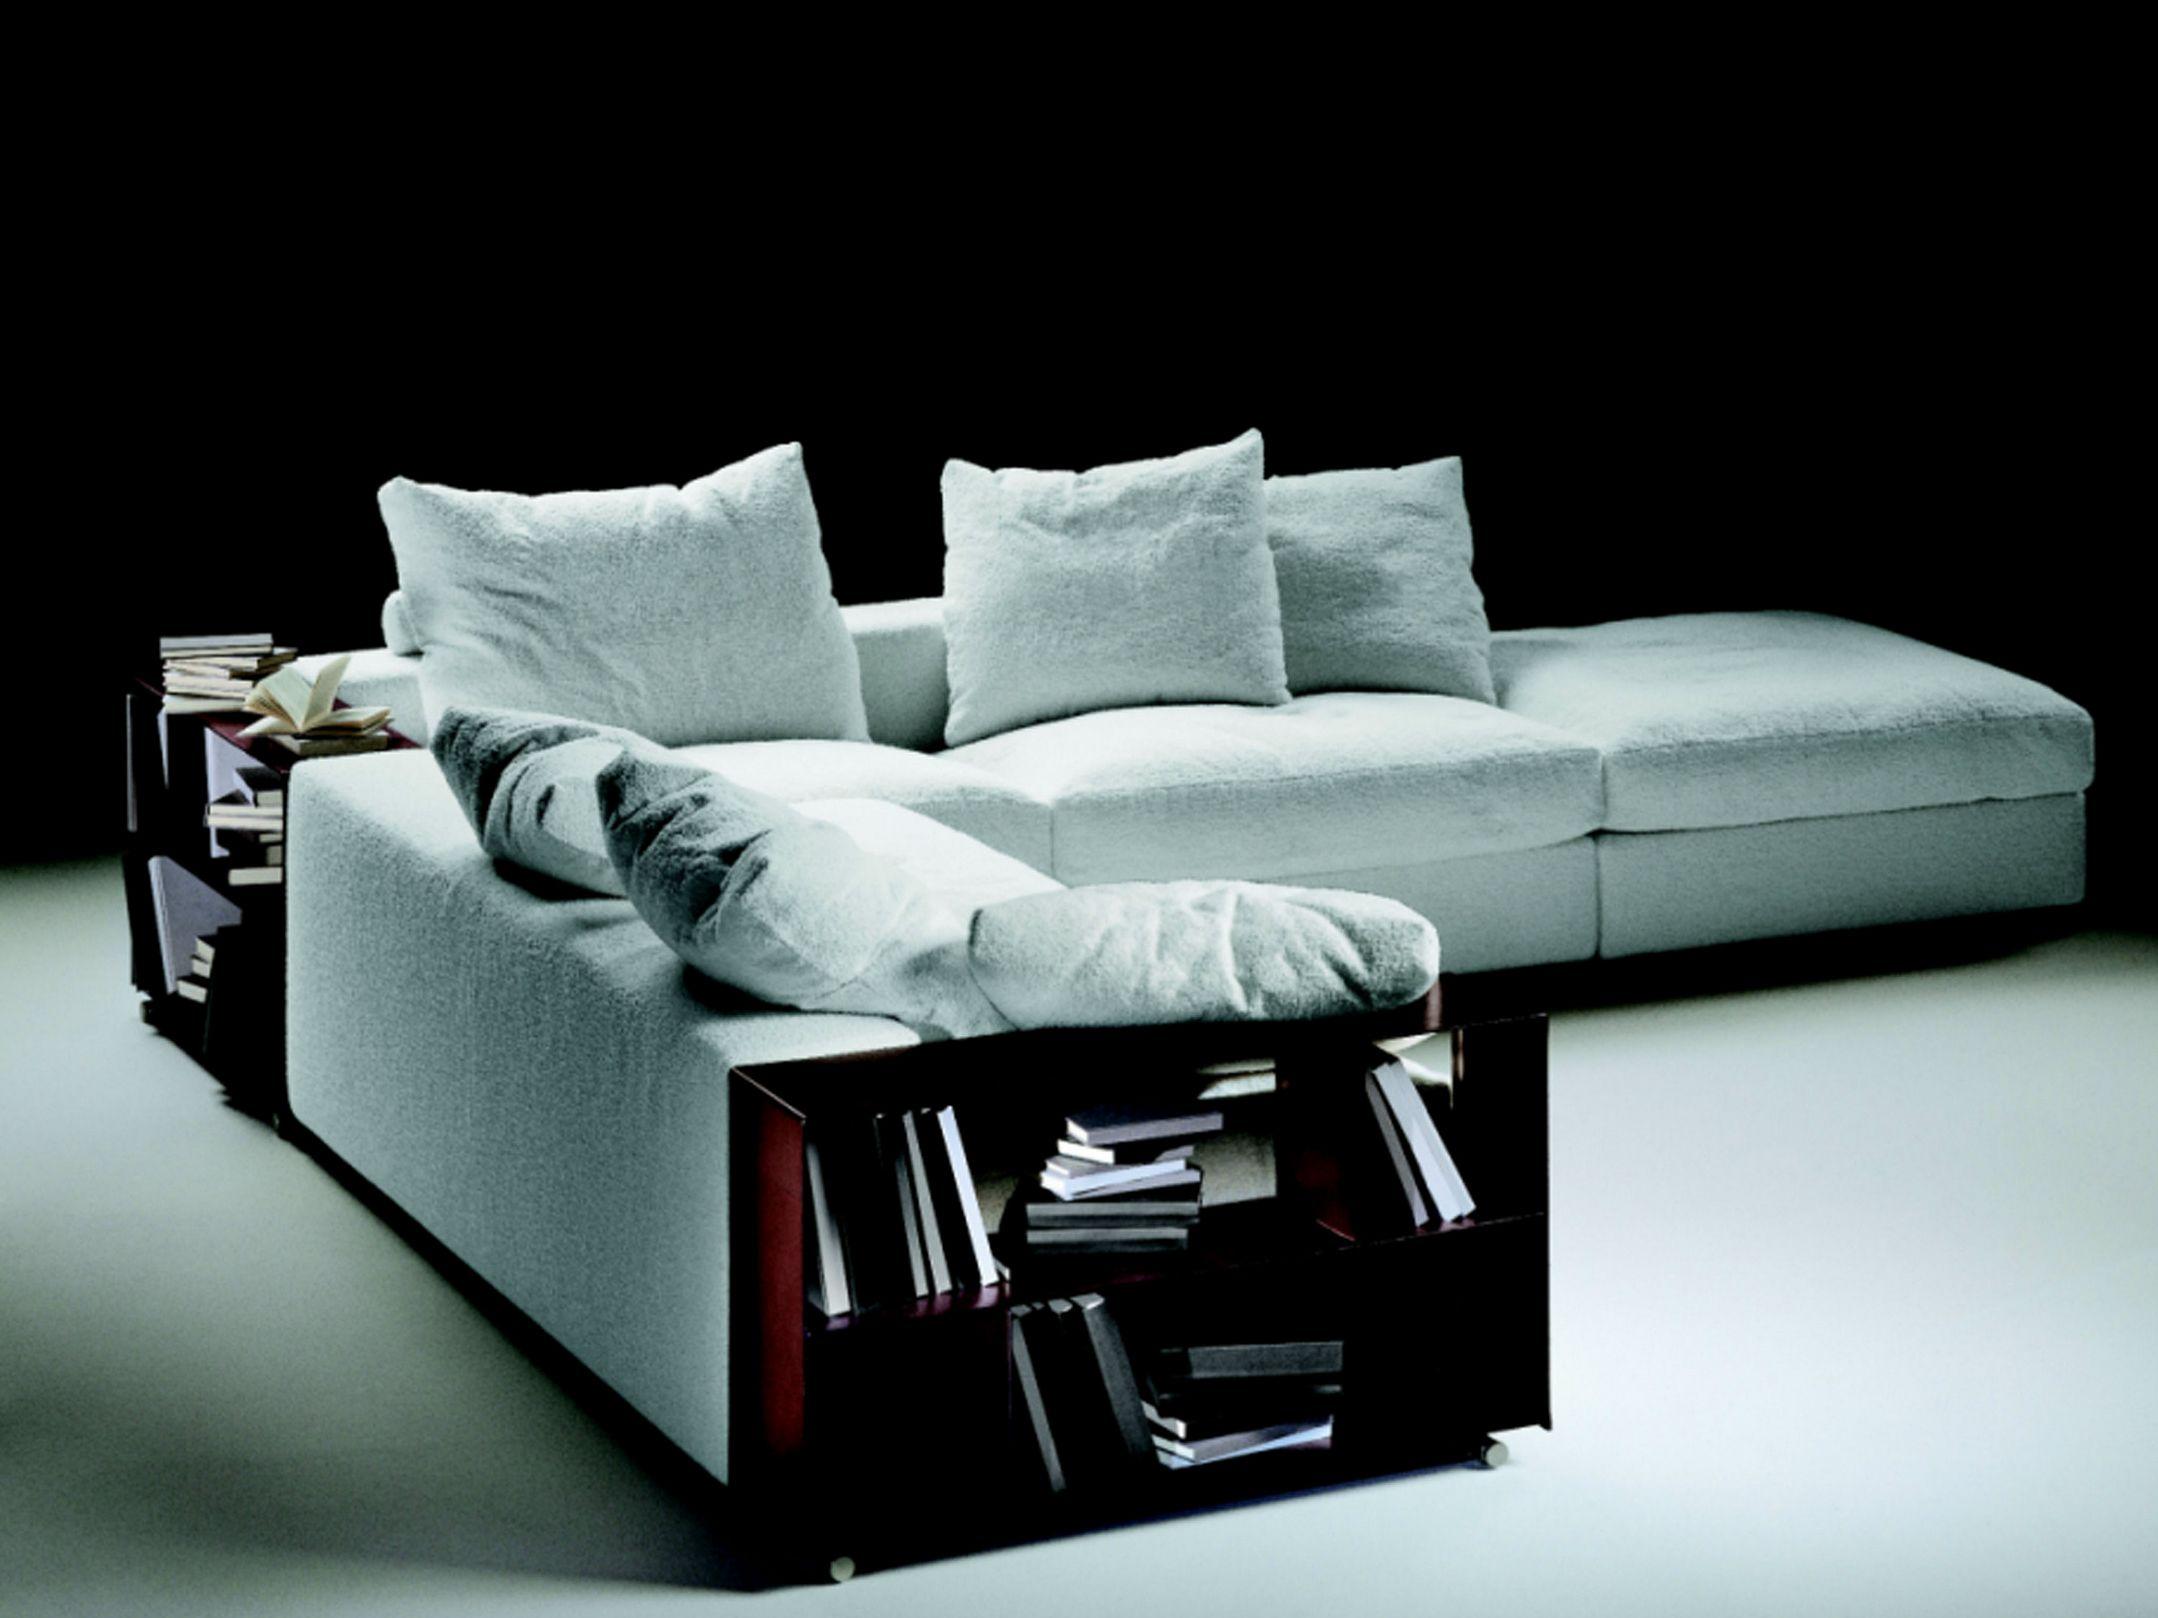 Groundpiece divano angolare by flexform design antonio for Flexform groundpiece